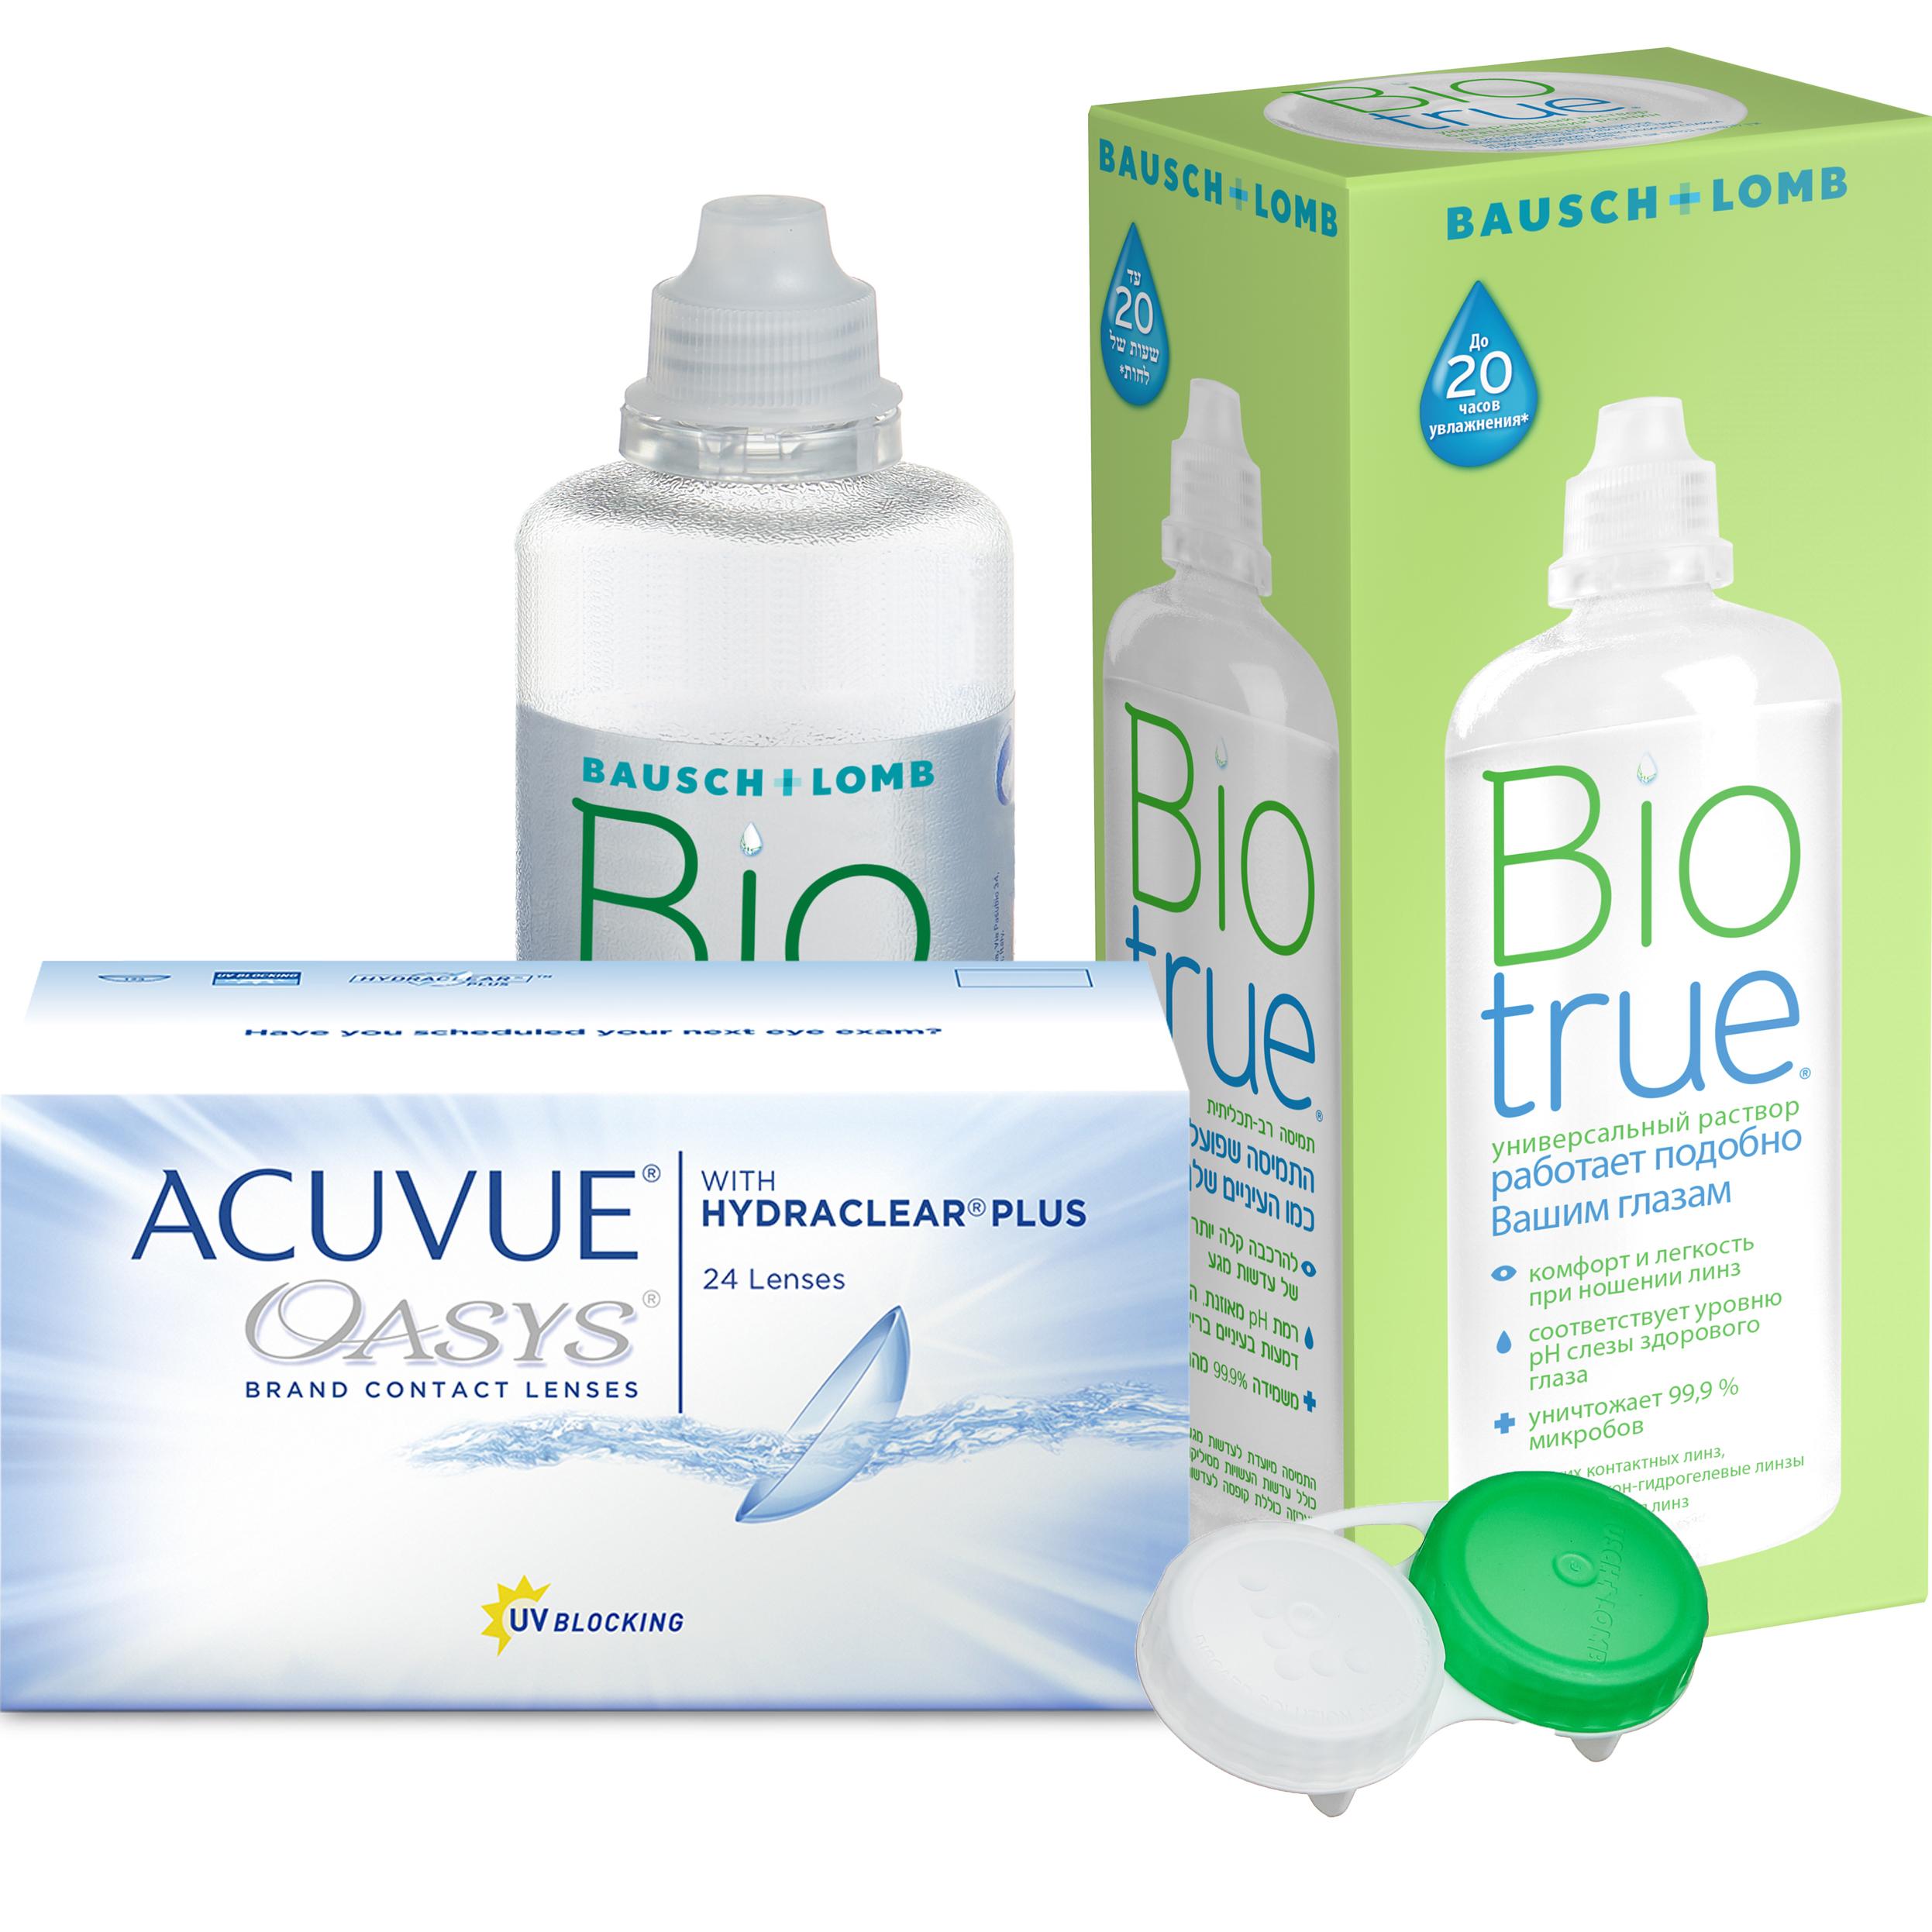 Купить Oasys with Hydraclear Plus 24 линзы + Biotrue, Контактные линзы Acuvue Oasys with Hydraclear Plus 24 линзы R 8.4 +5, 25 + Biotrue 300 мл